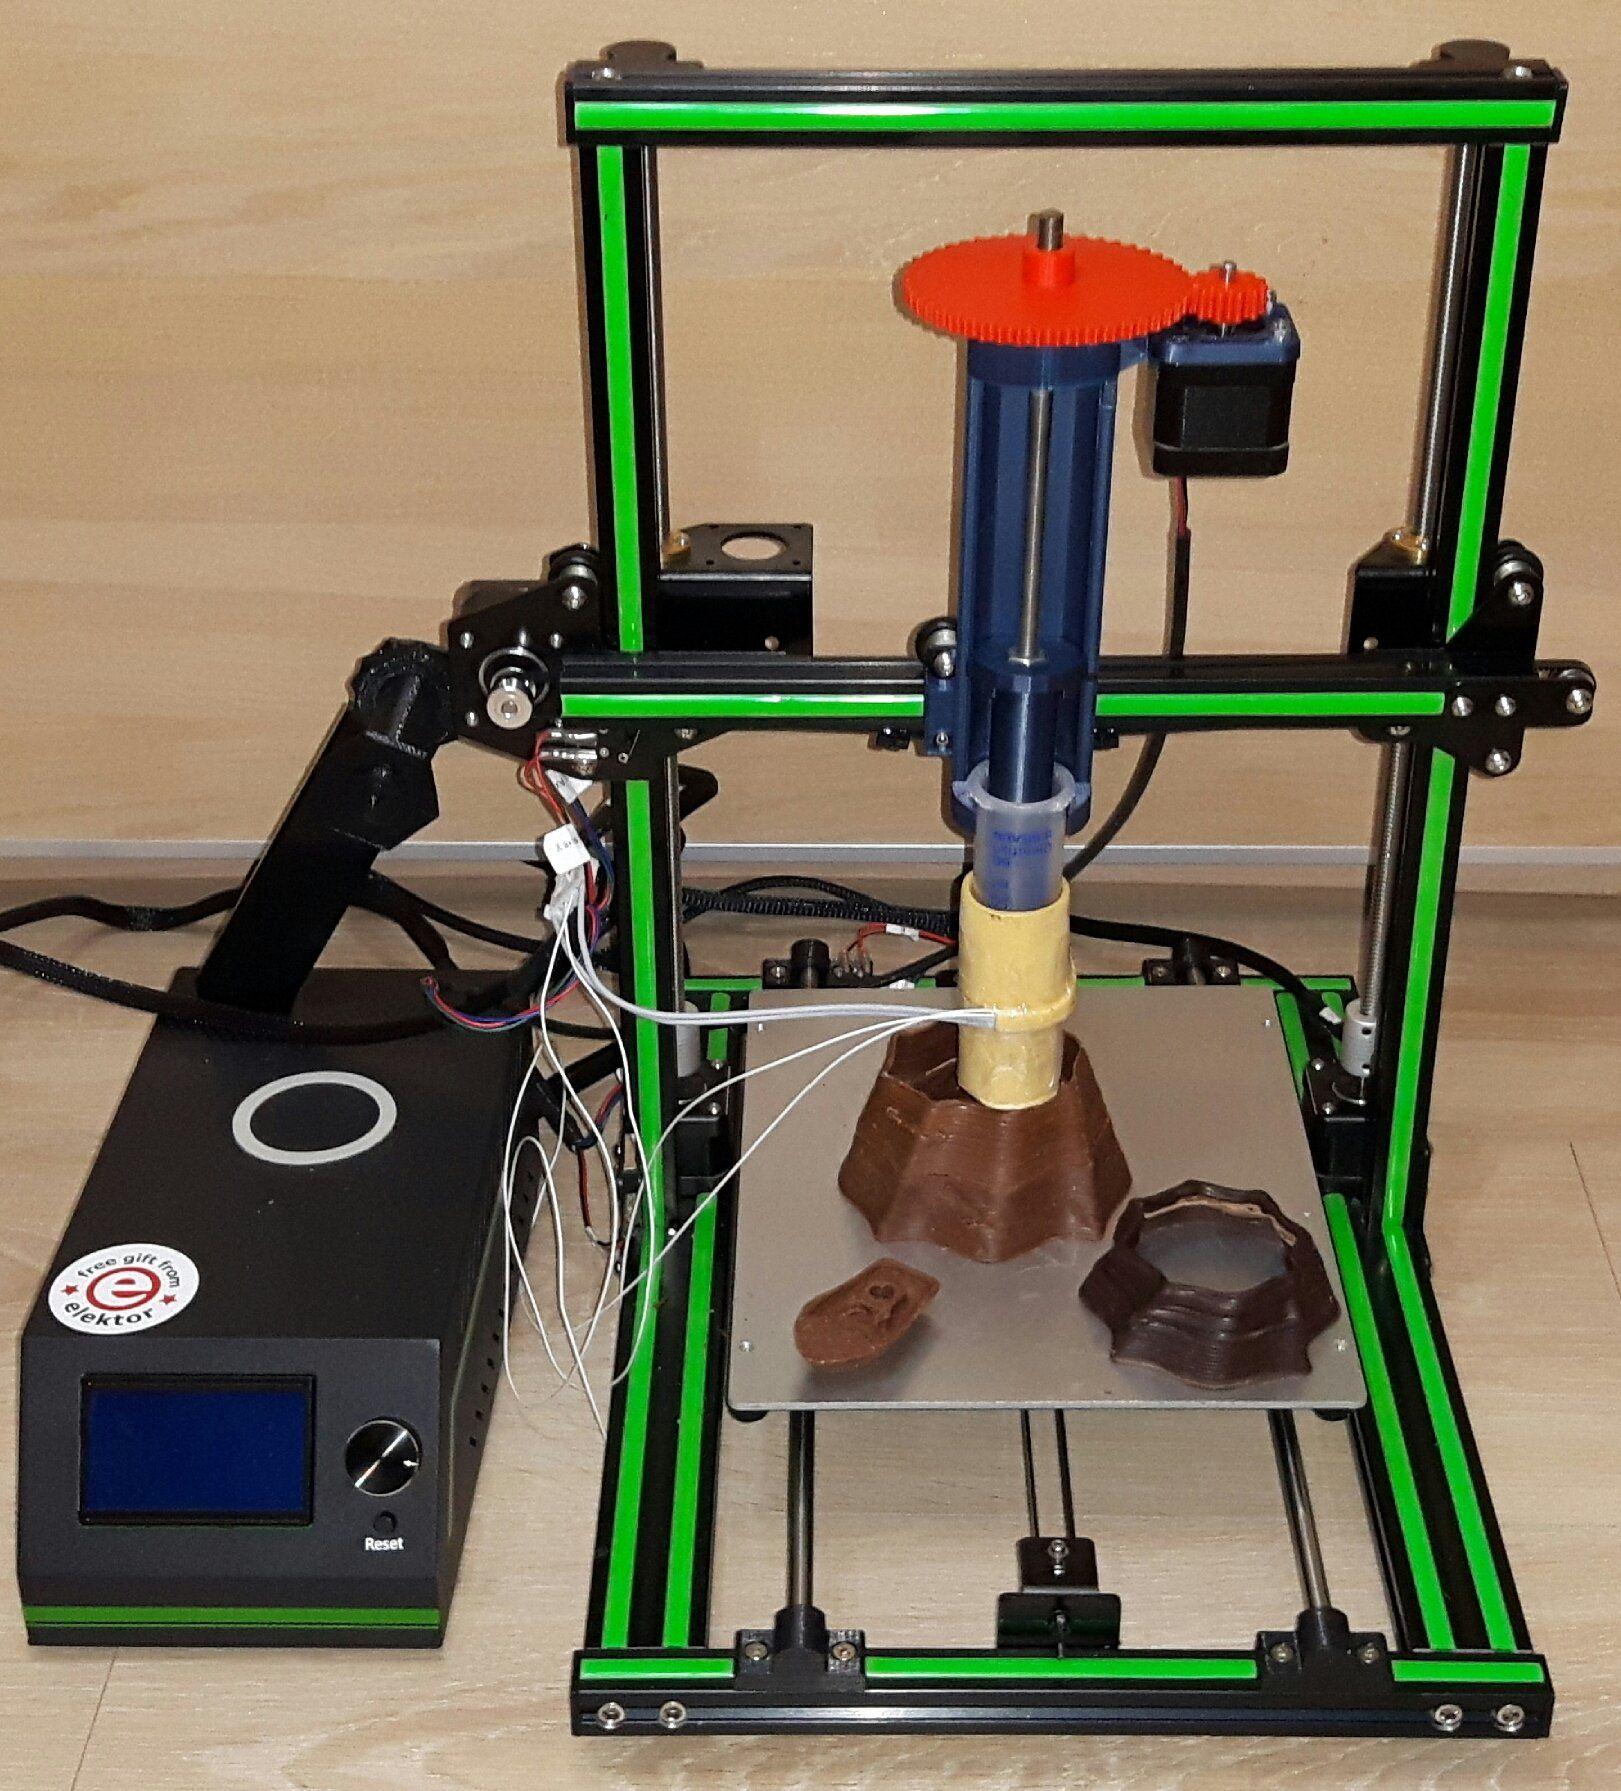 Chocolate 3d Printer Chocolate Extruder By Marvtec By Marvtec Thingiverse Chocolate 3d Printer 3d Printer Printer